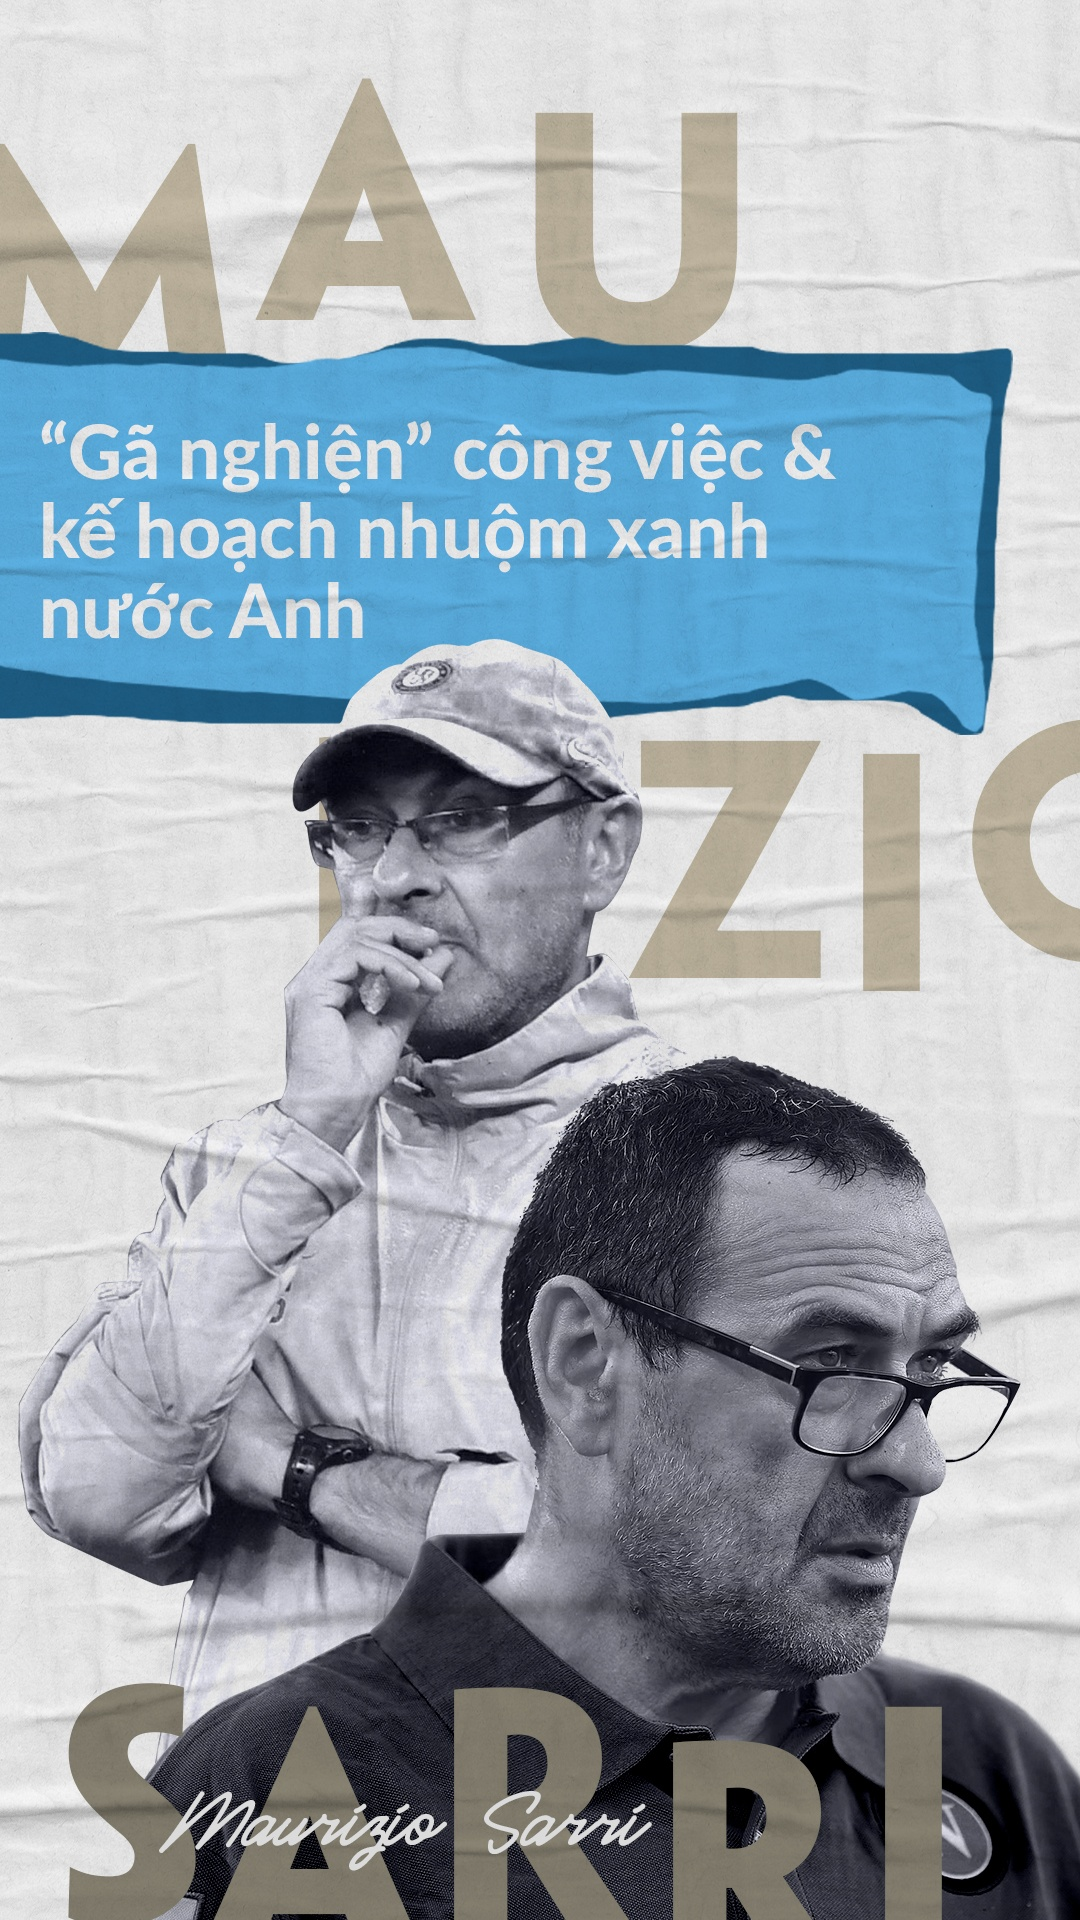 Maurizio Sarri - 'ga nghien' cong viec va ke hoach nhuom xanh nuoc Anh hinh anh 1